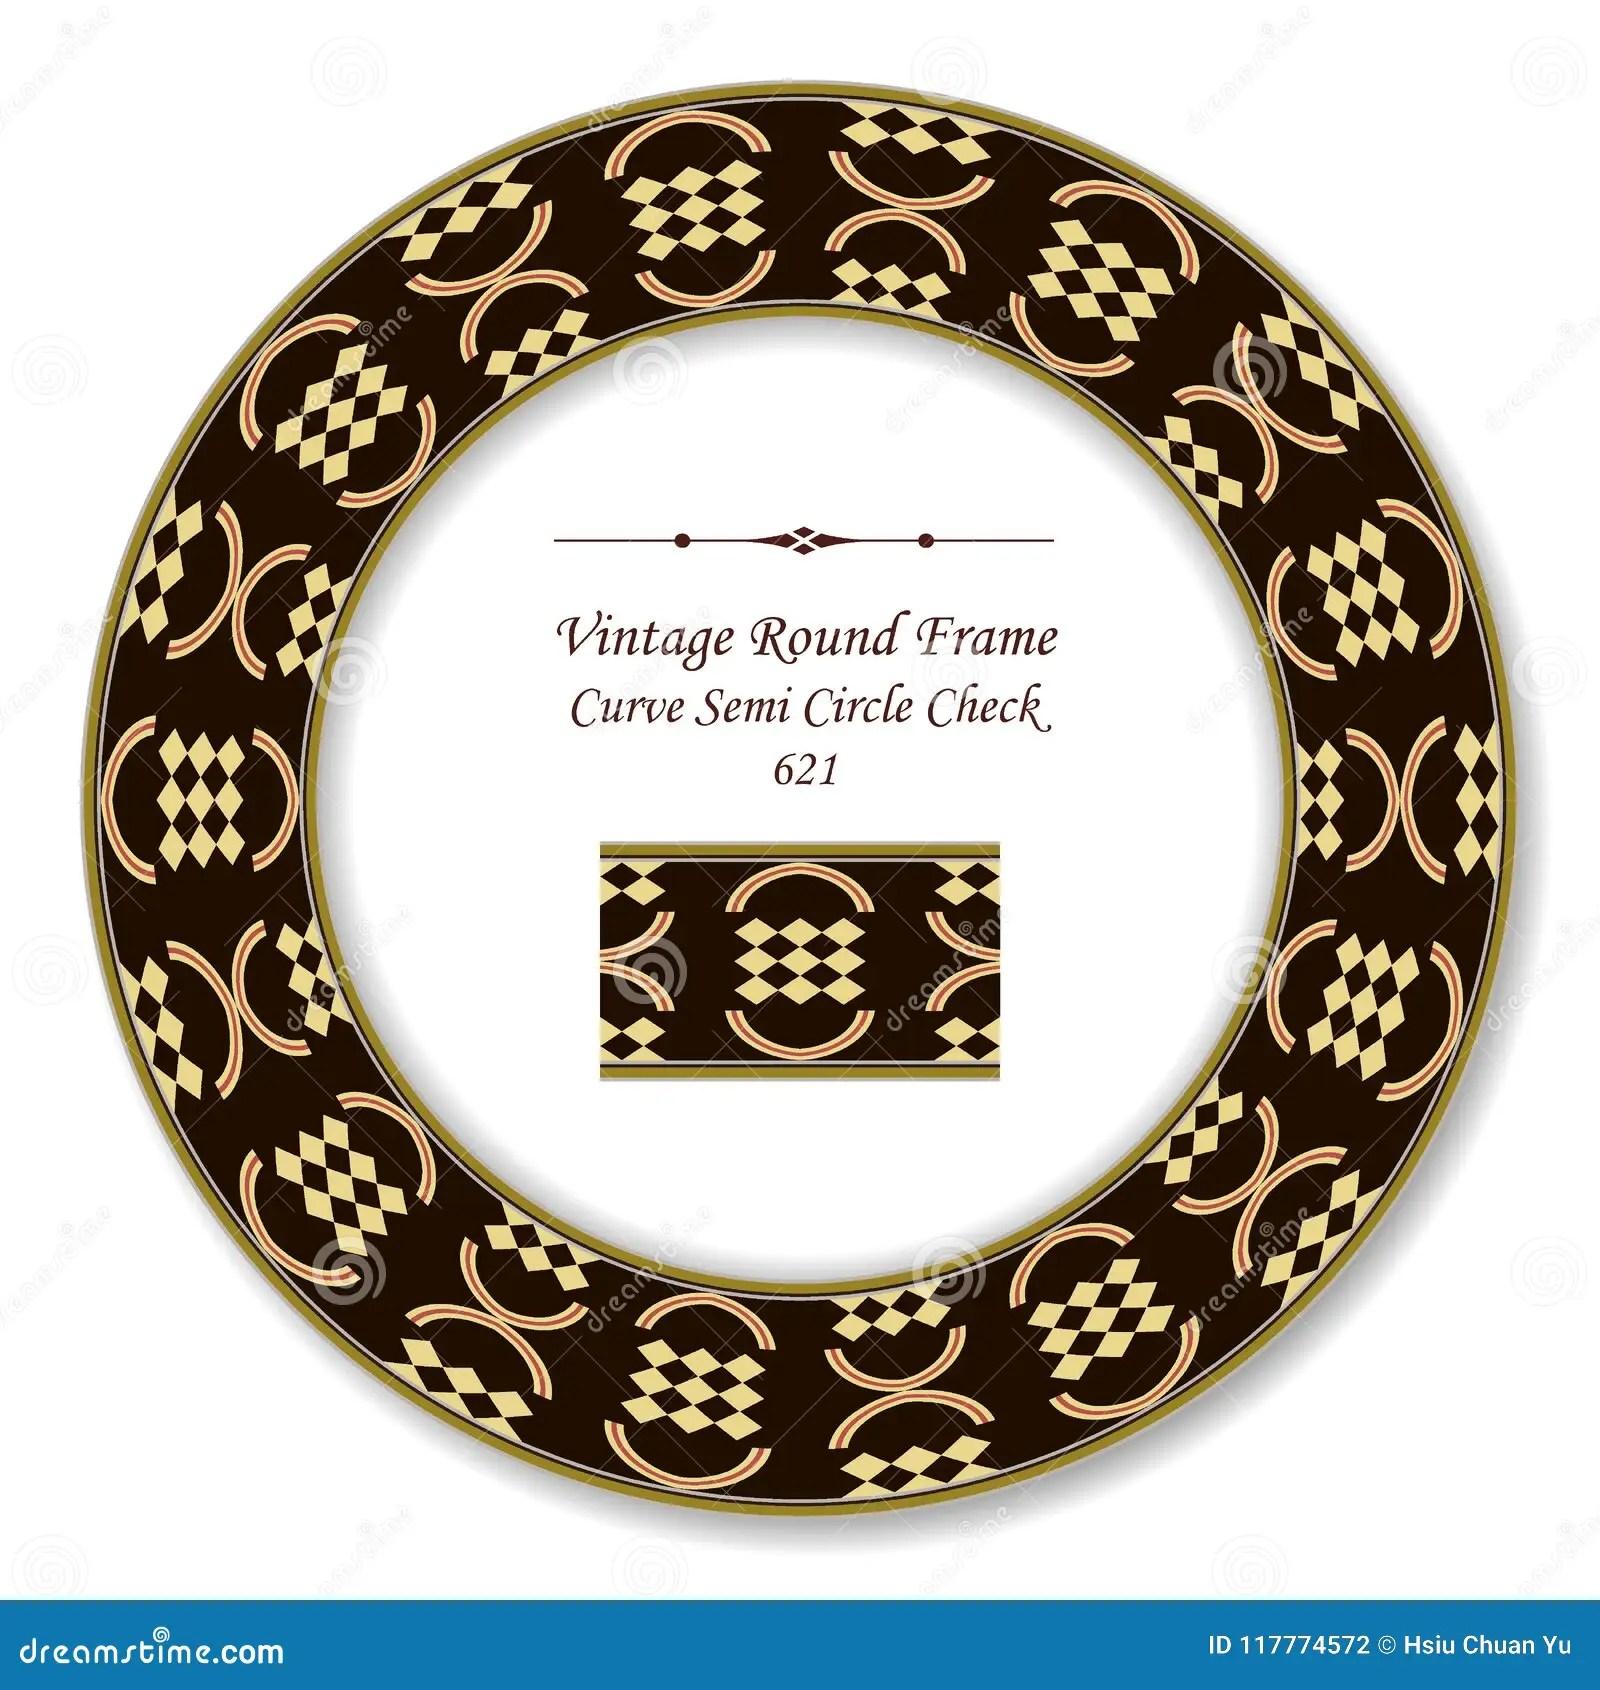 Vintage Round Retro Frame Curve Semi Circle Check Geometry